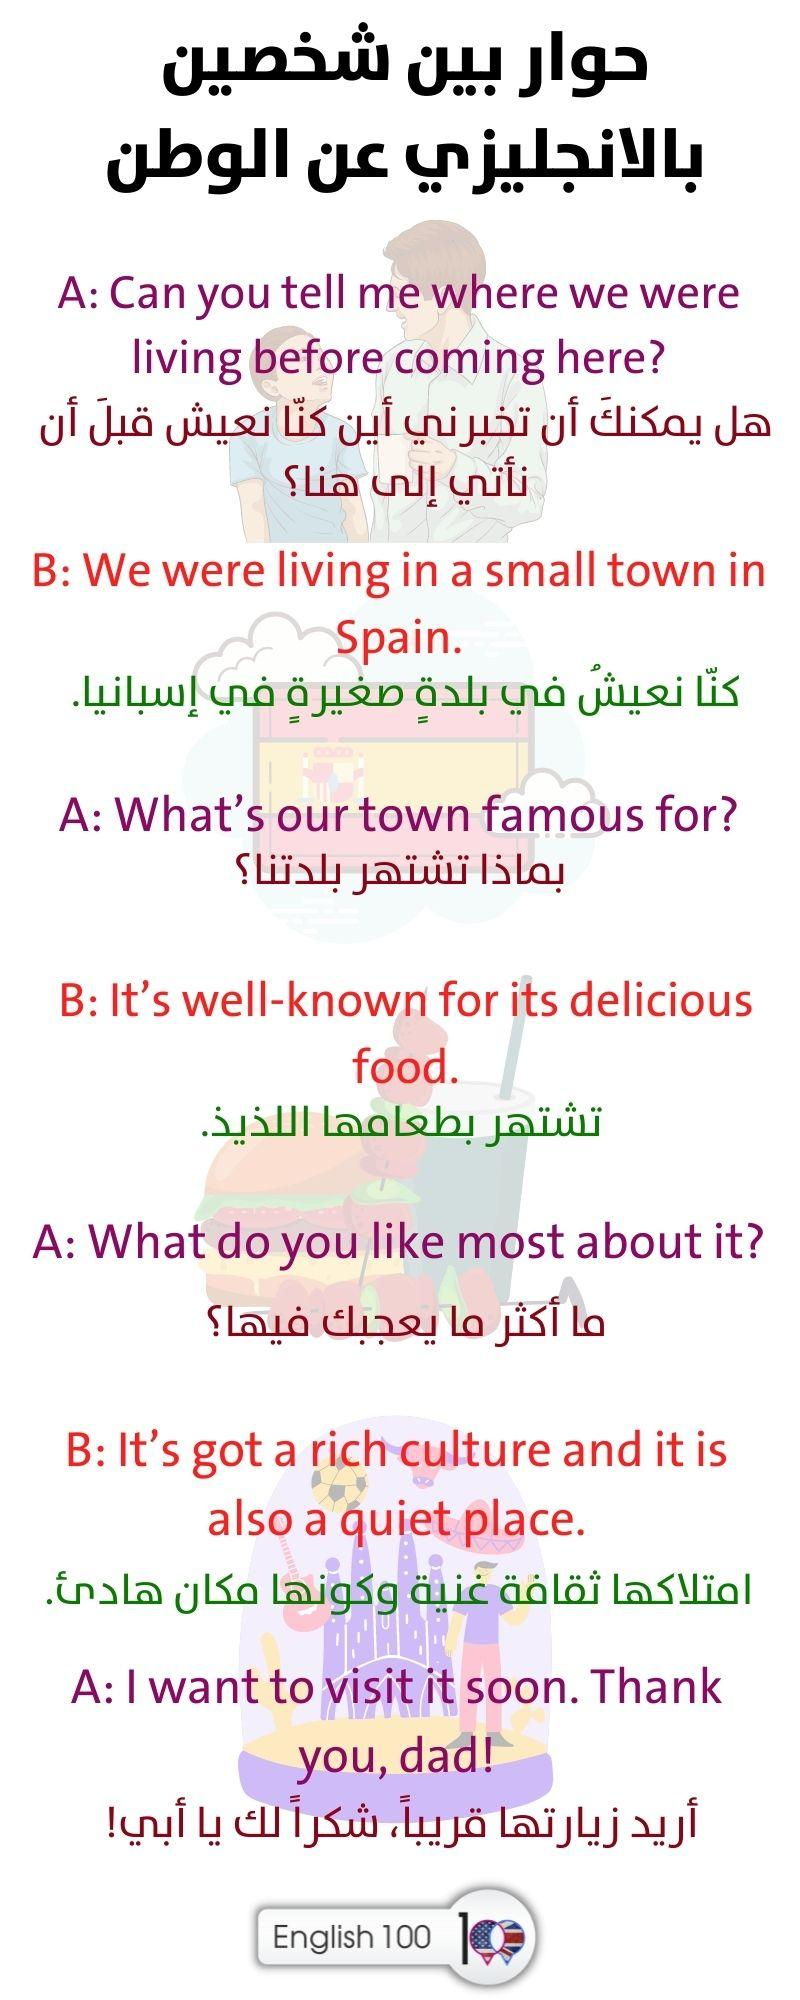 حوار بين شخصين بالانجليزي عن الوطن A Dialogue Between Two People about Homeland In English